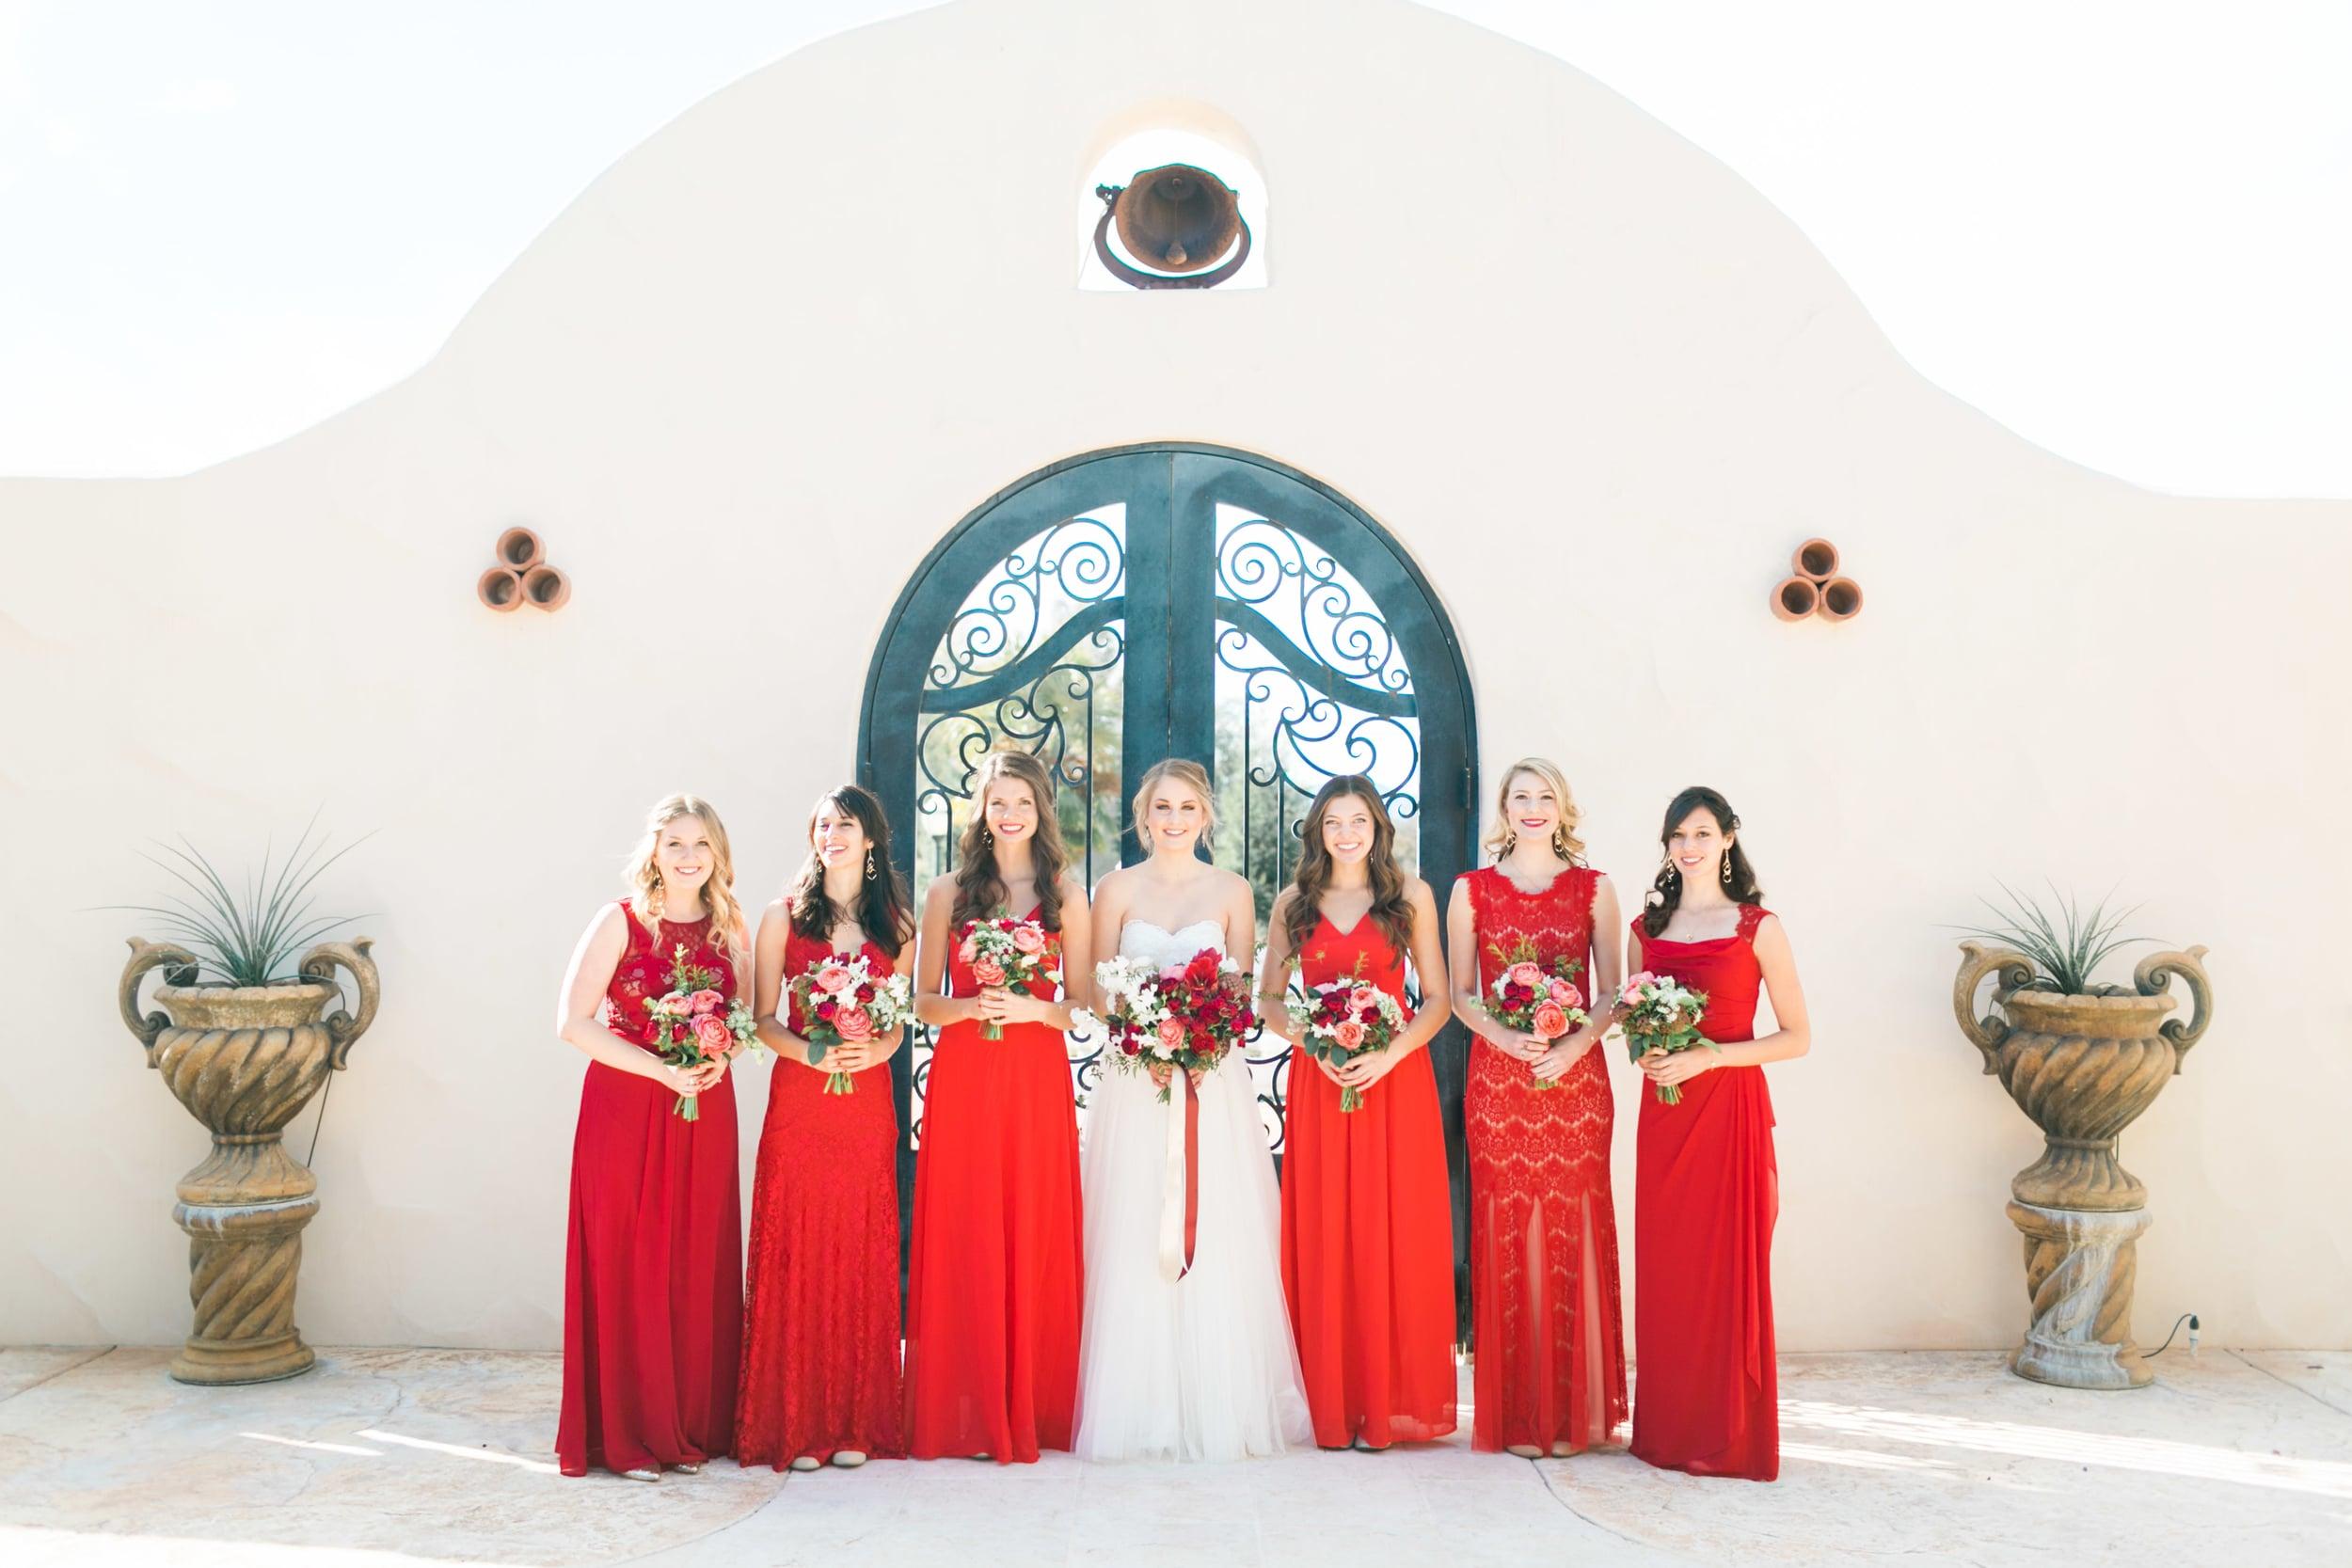 Natalie_Schutt_Photography_Winter_Wedding_San_Luis_Obispo-56.jpg